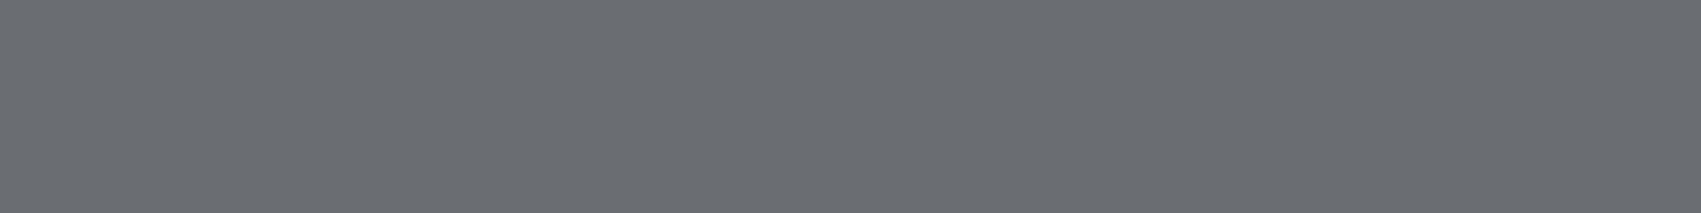 NEWSHA_Logo_LilieLinks_web_grau